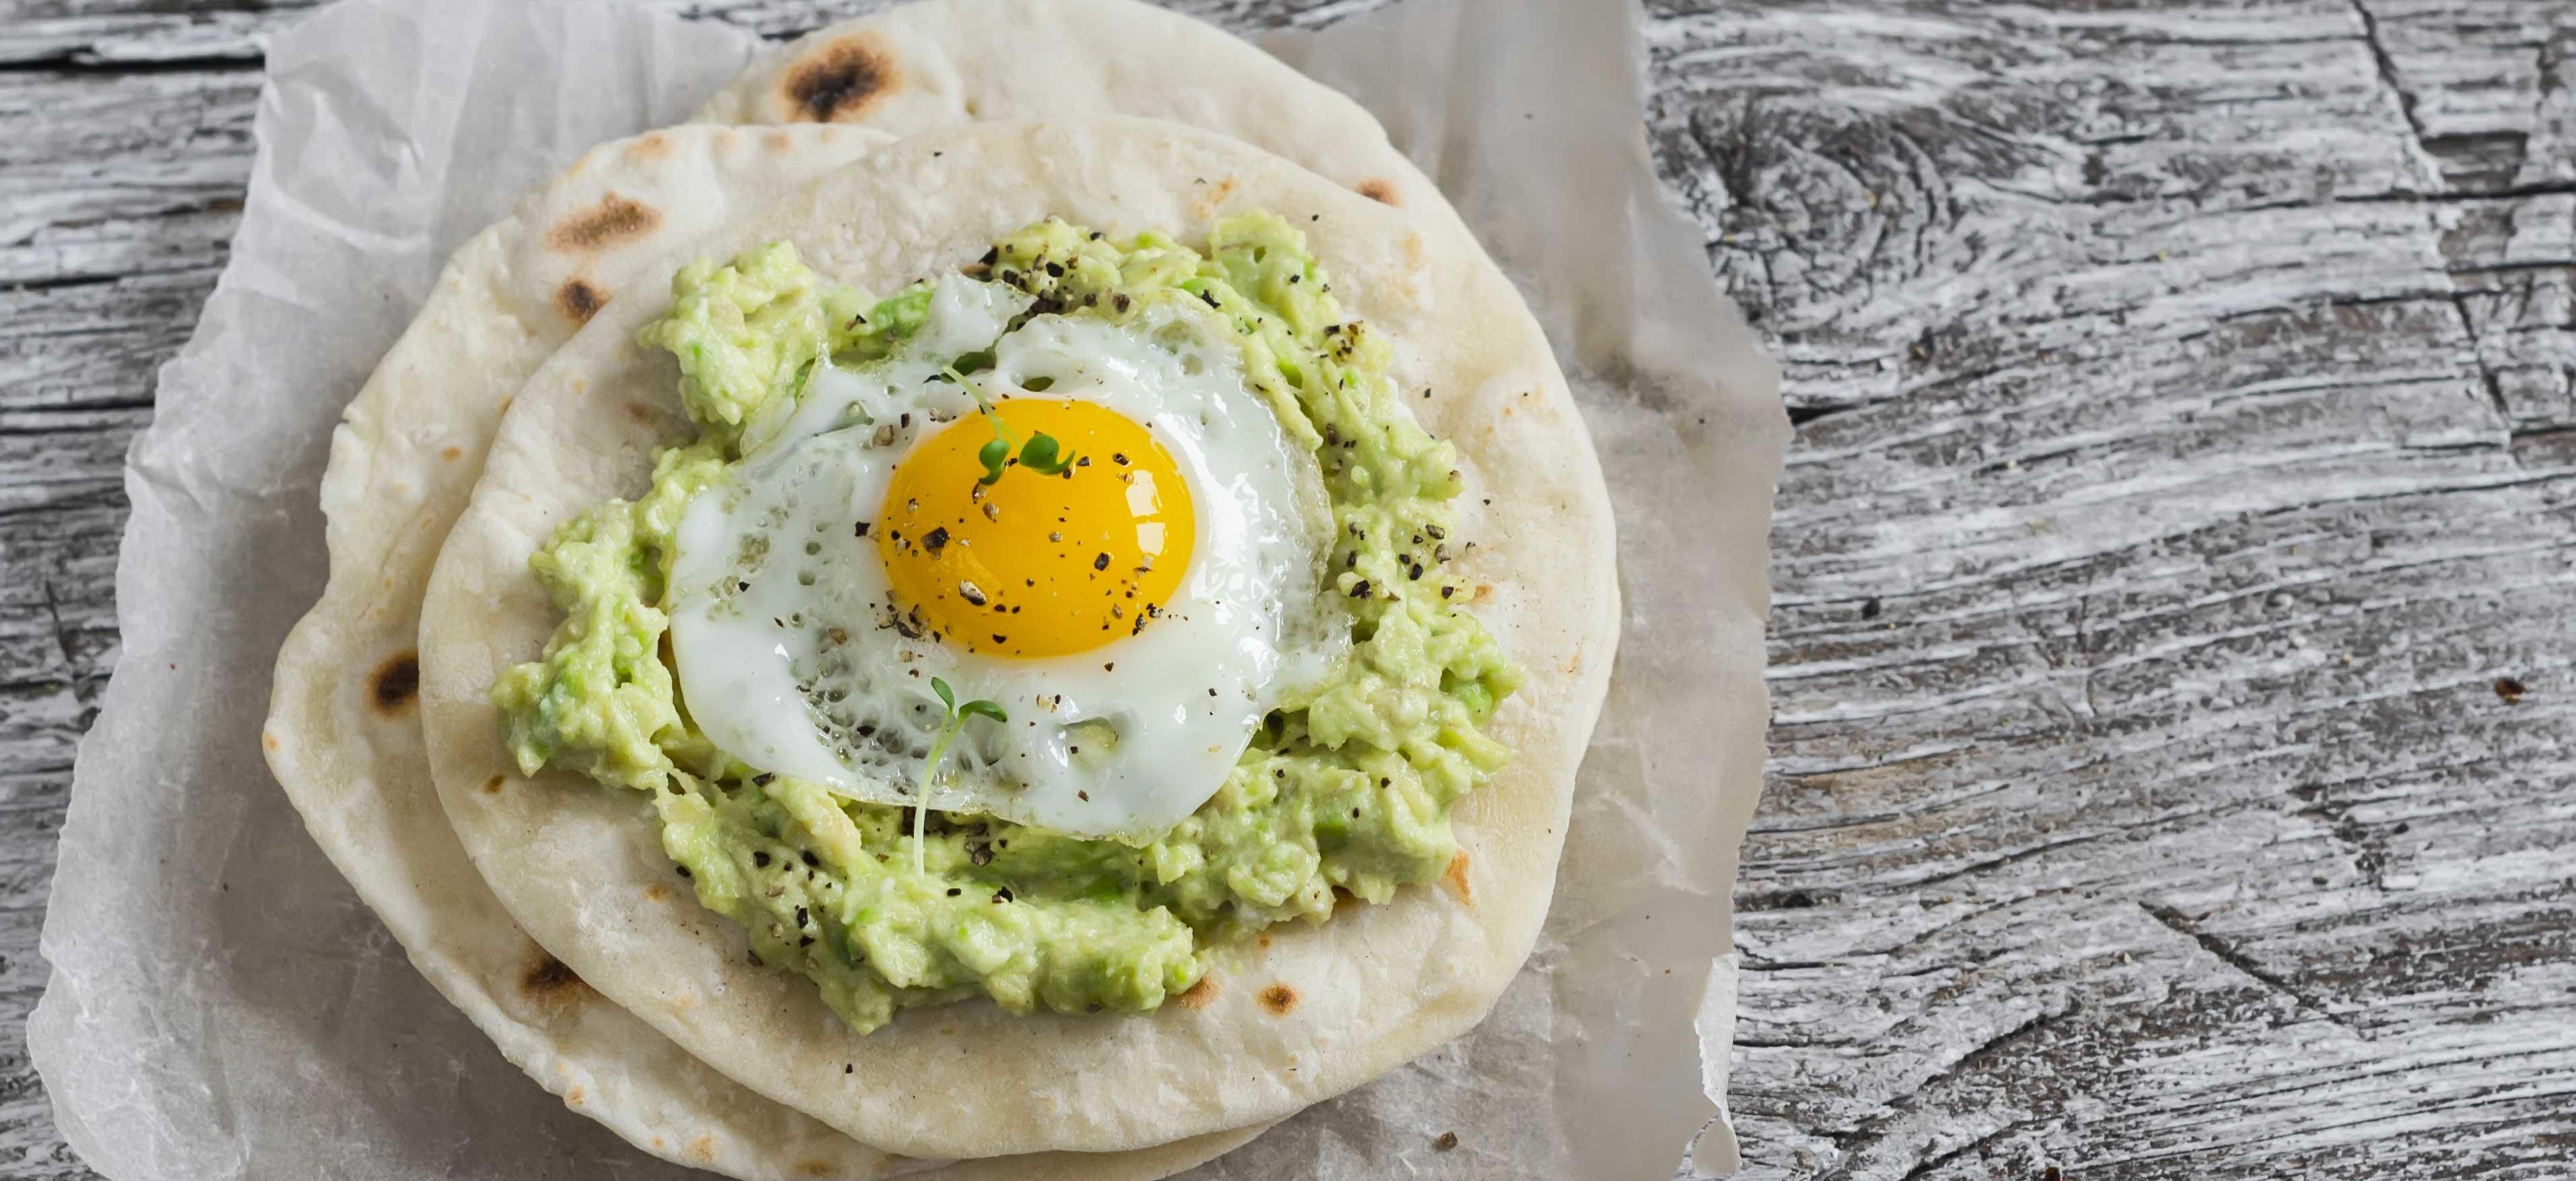 Ontbijttortilla met avocado en ei